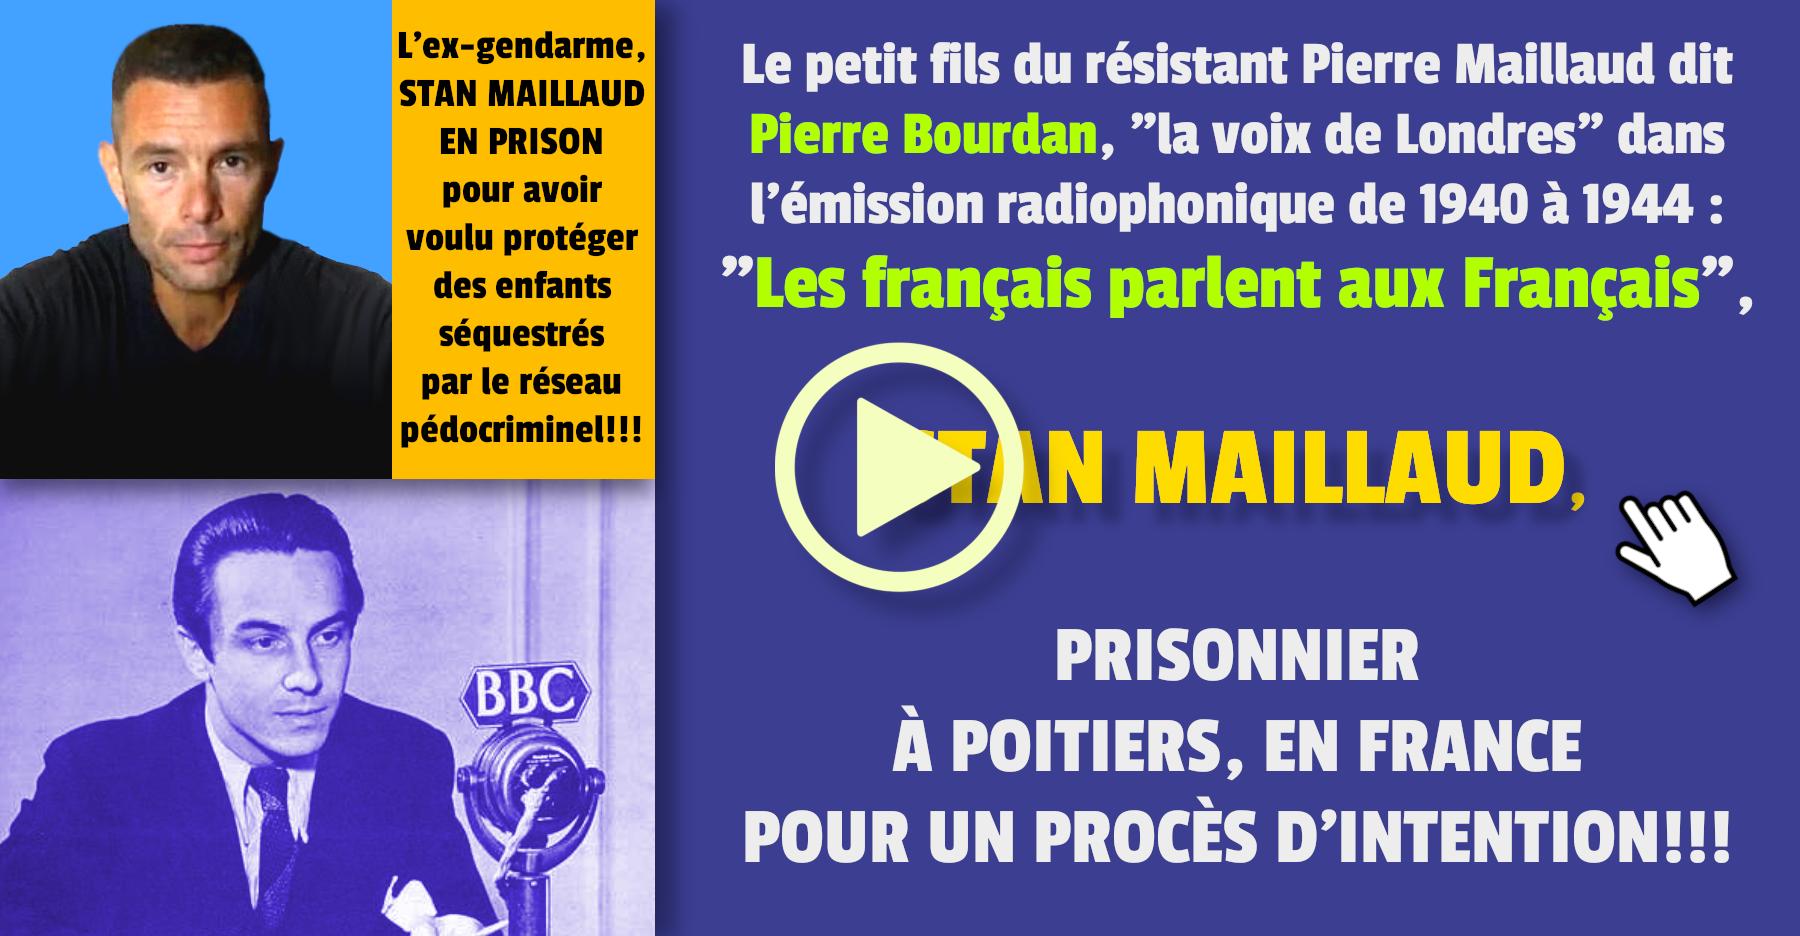 Liberez Stan Maillaud!!!